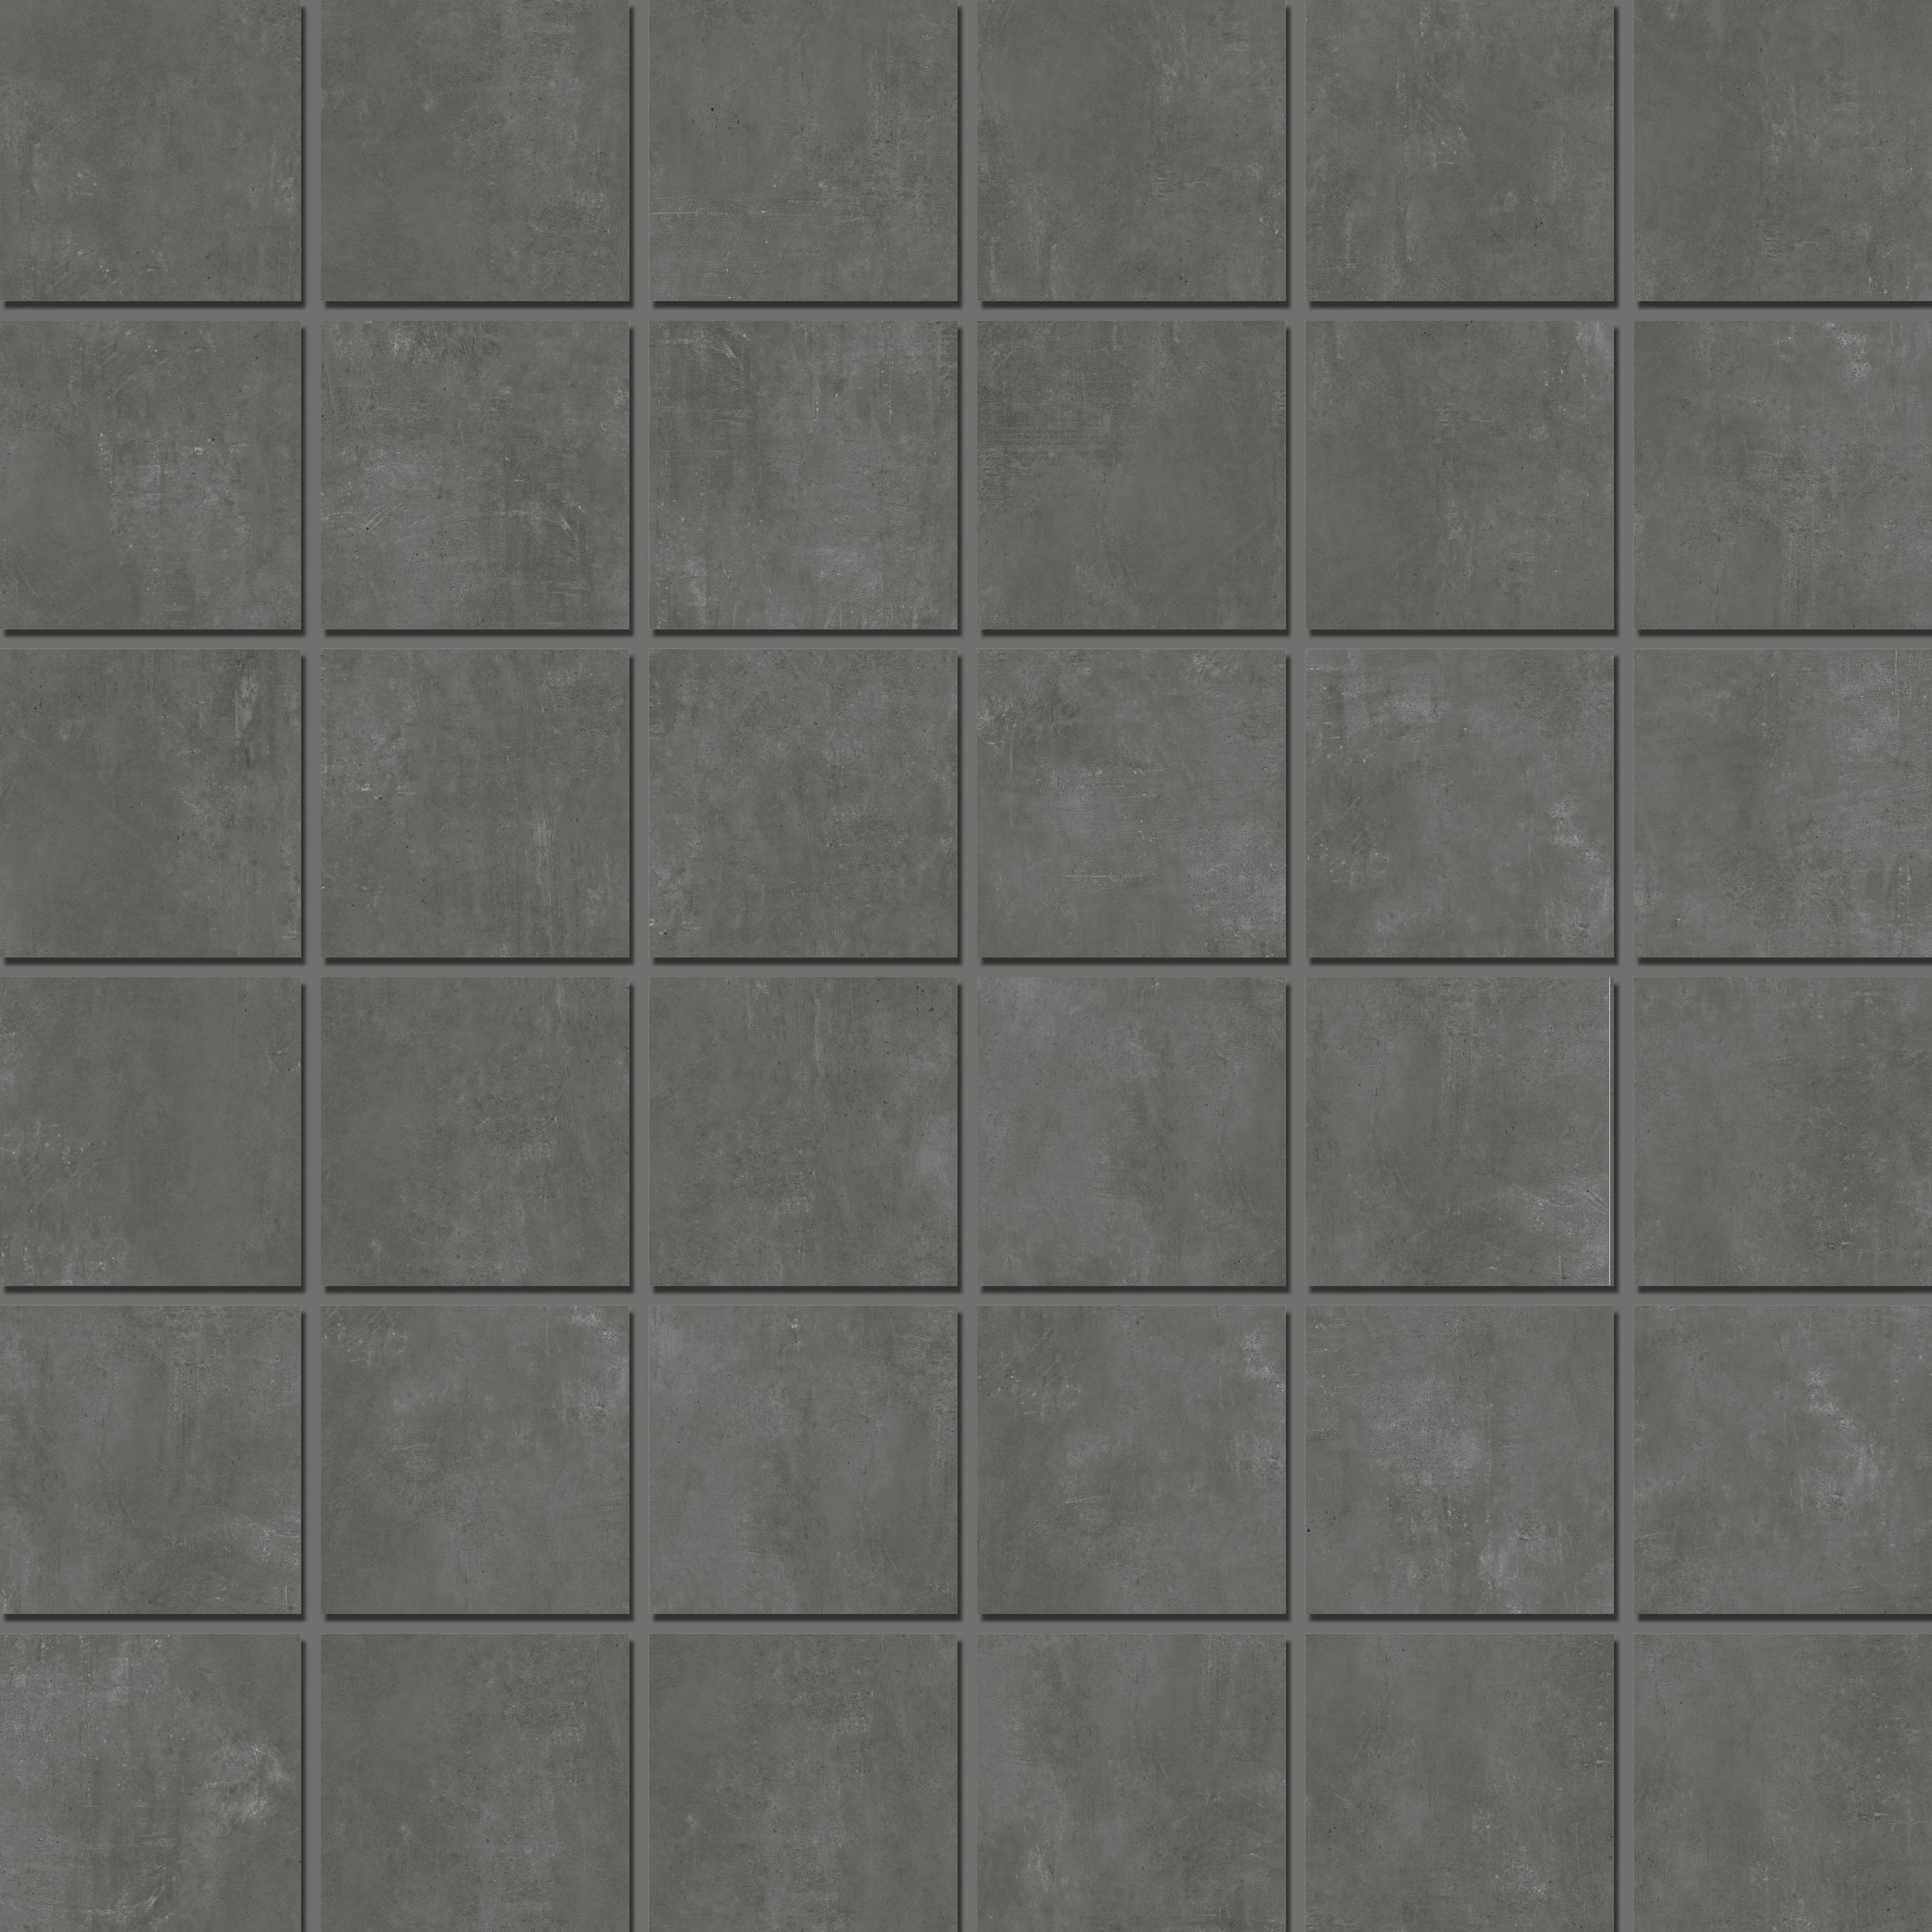 Mosaic 4,7x4,7 Anthracite